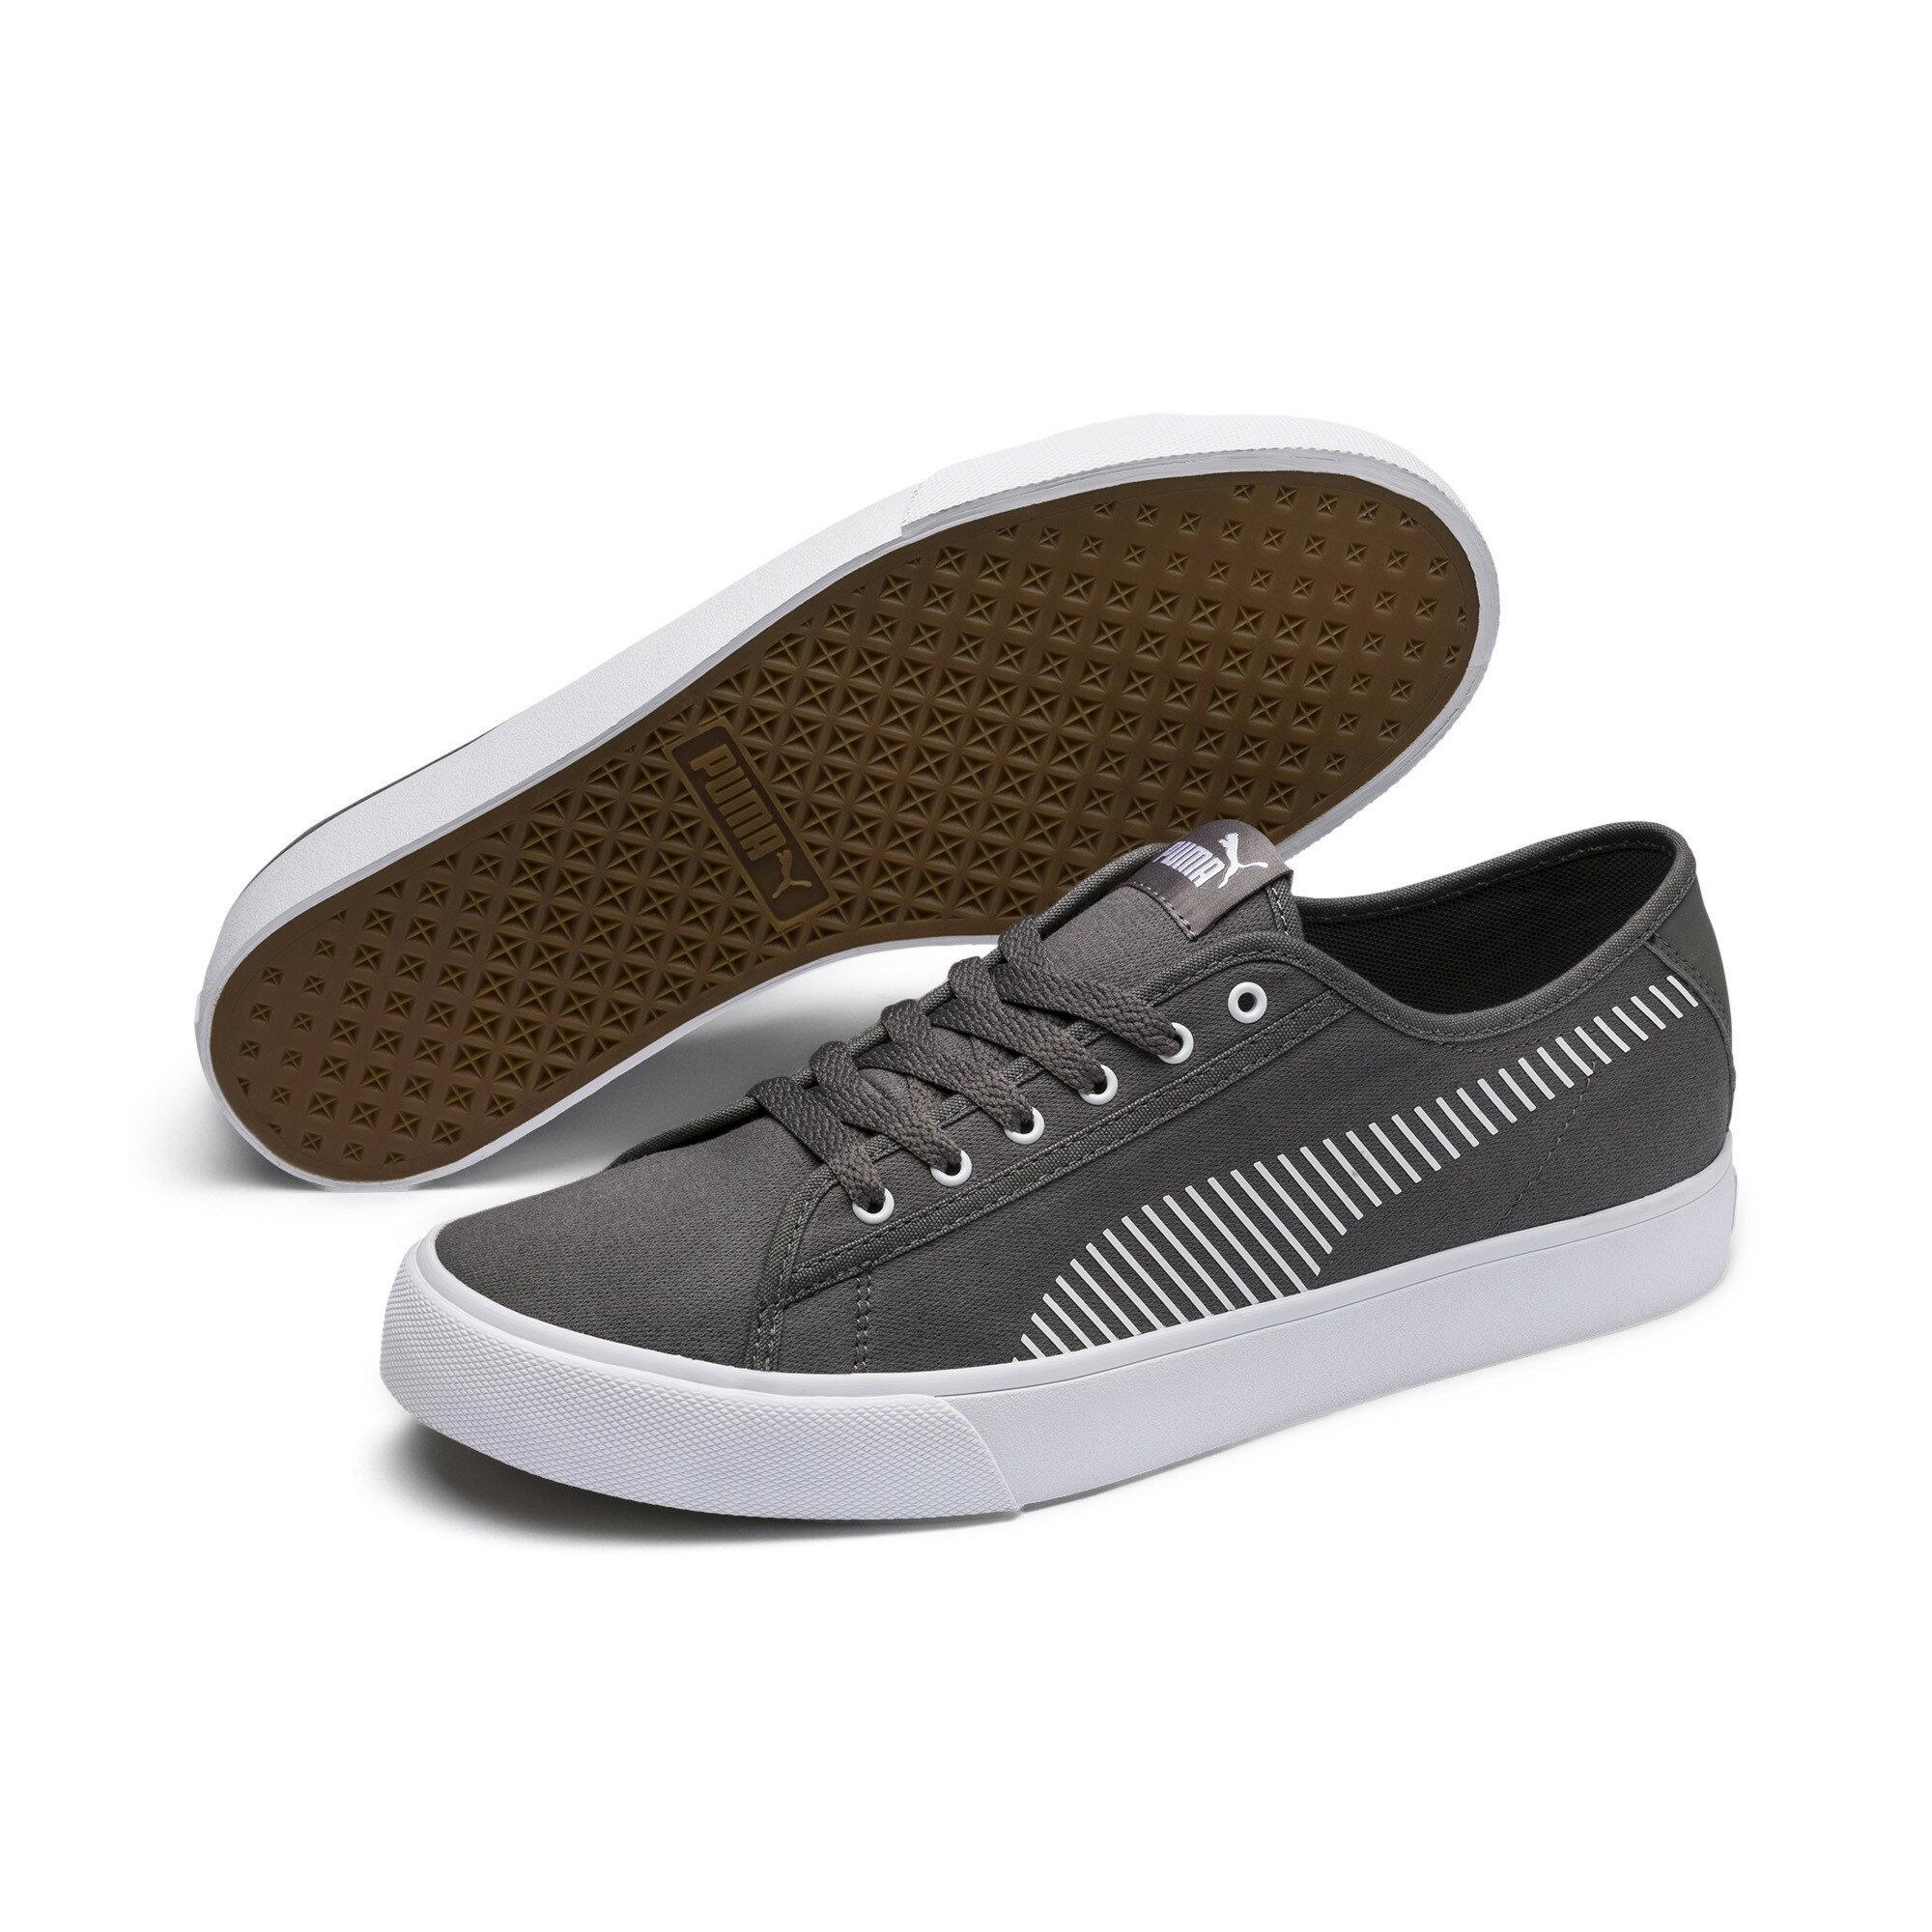 409a359e2b Official Puma Store: PUMA Bari Sneakers Men Shoe Basics   Rakuten.com